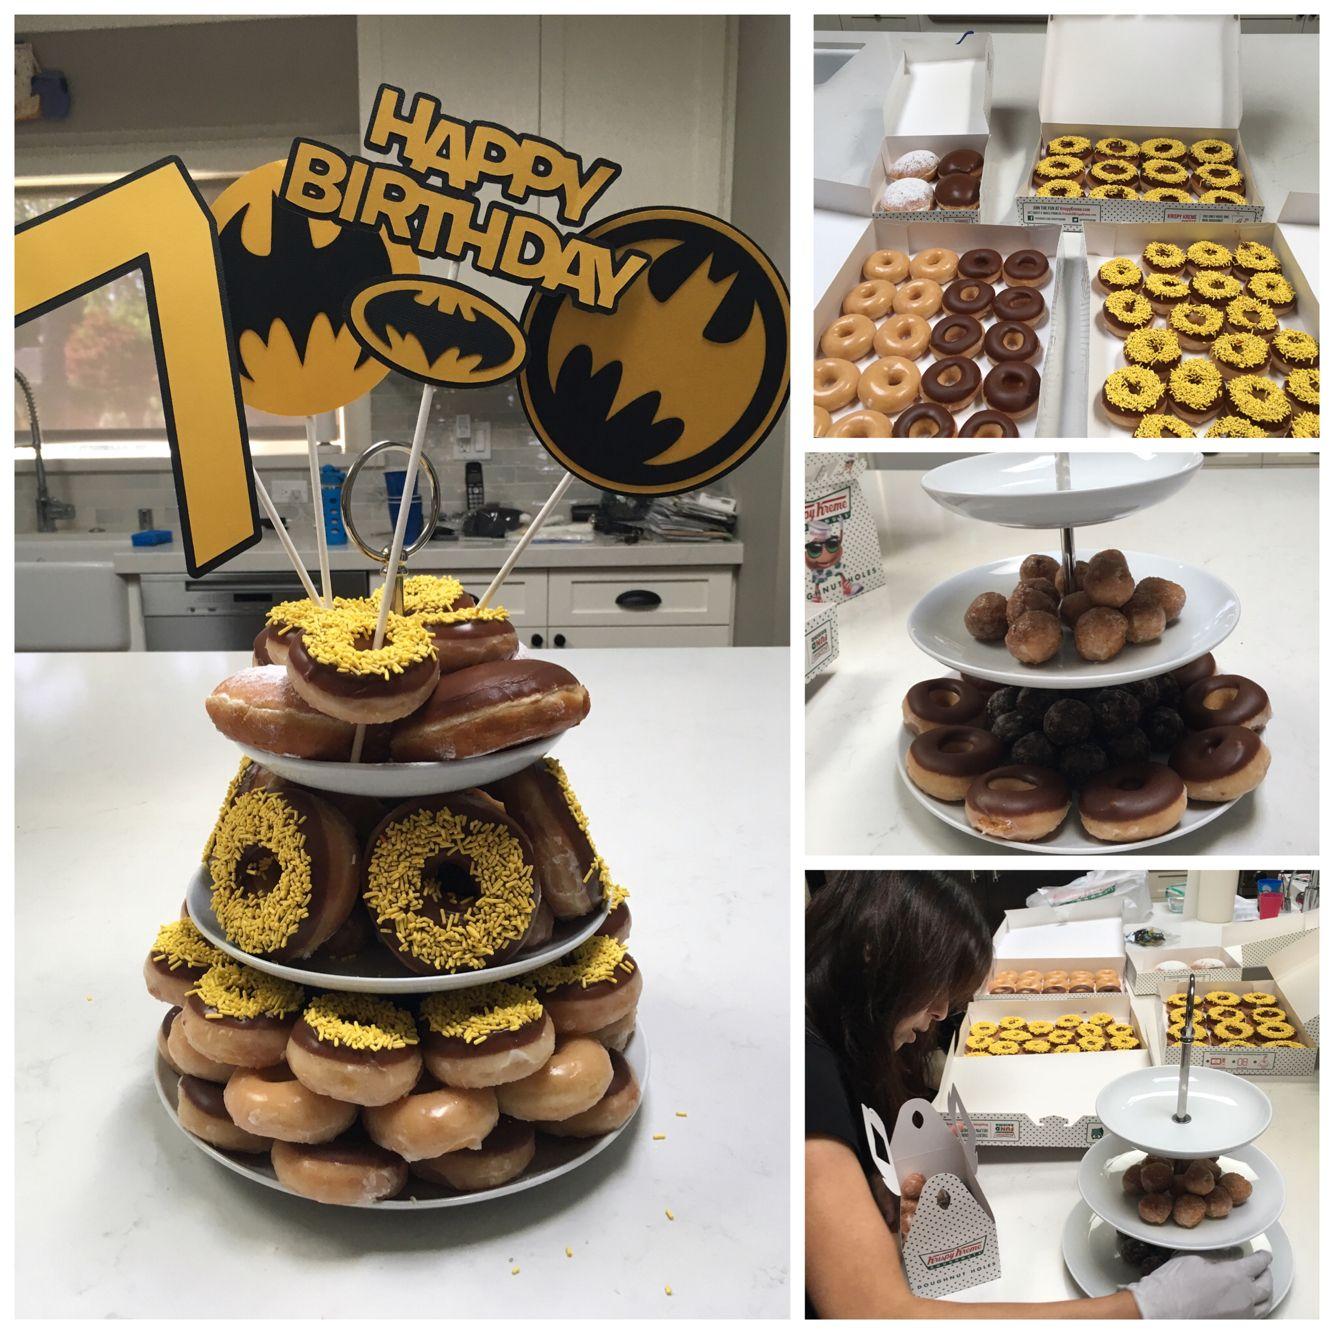 Batman donut cake tower most expensive birthday cake so